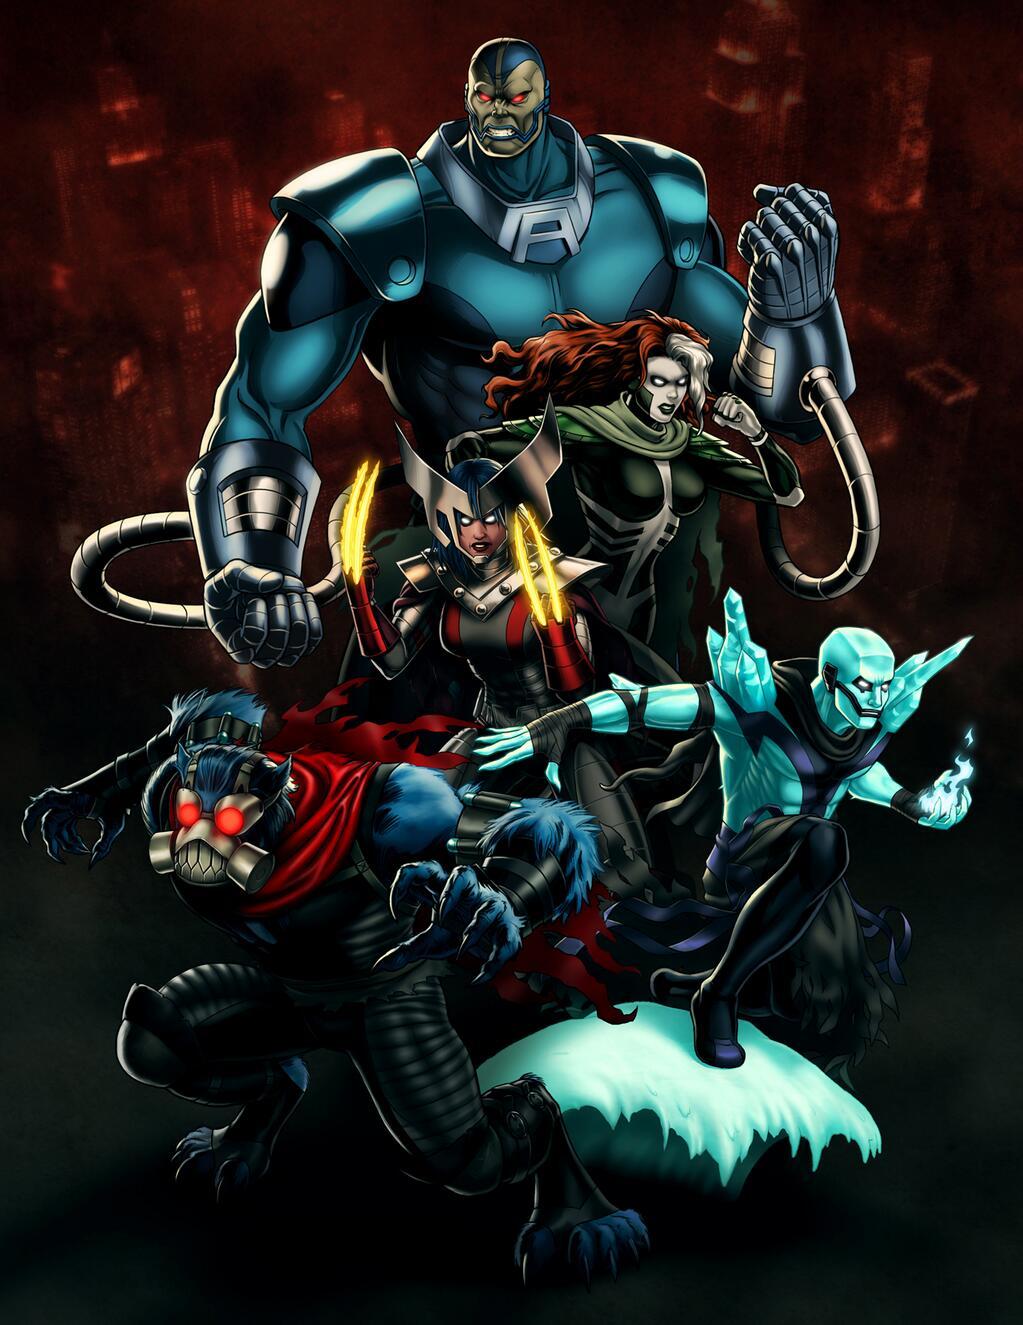 Horsemen of Apocalypse (Earth-12131)